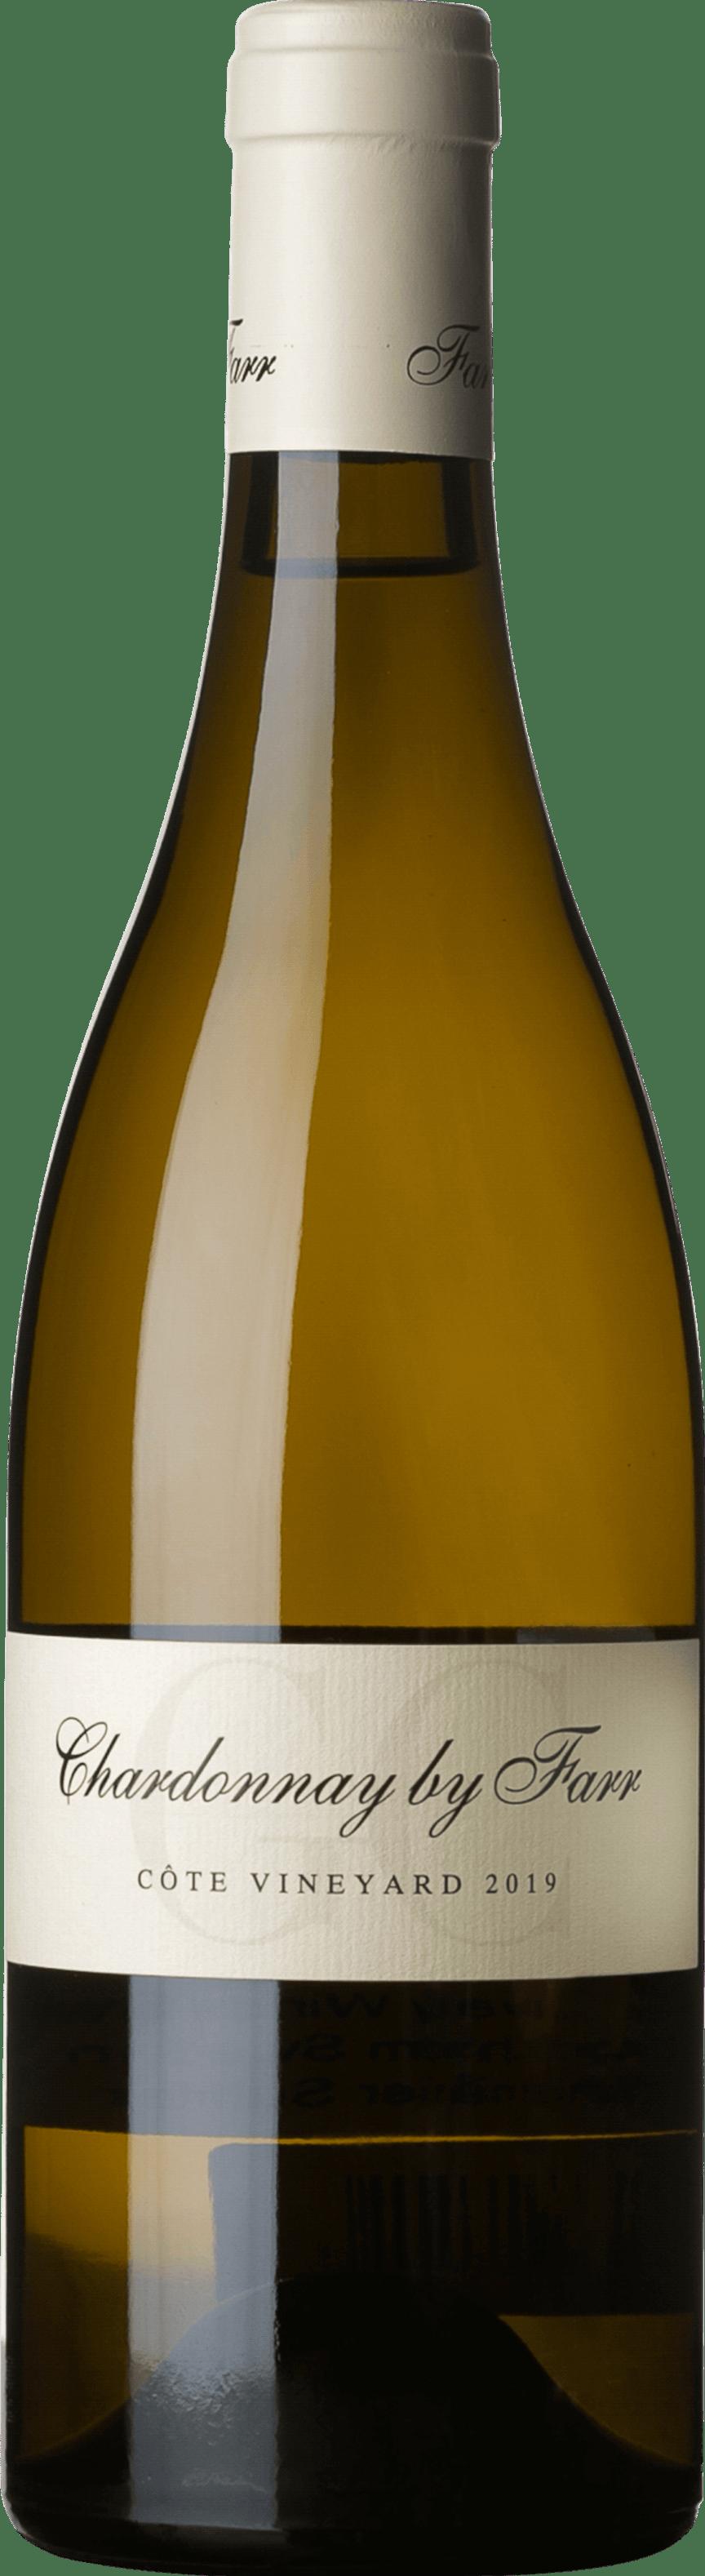 GC Chardonnay.png